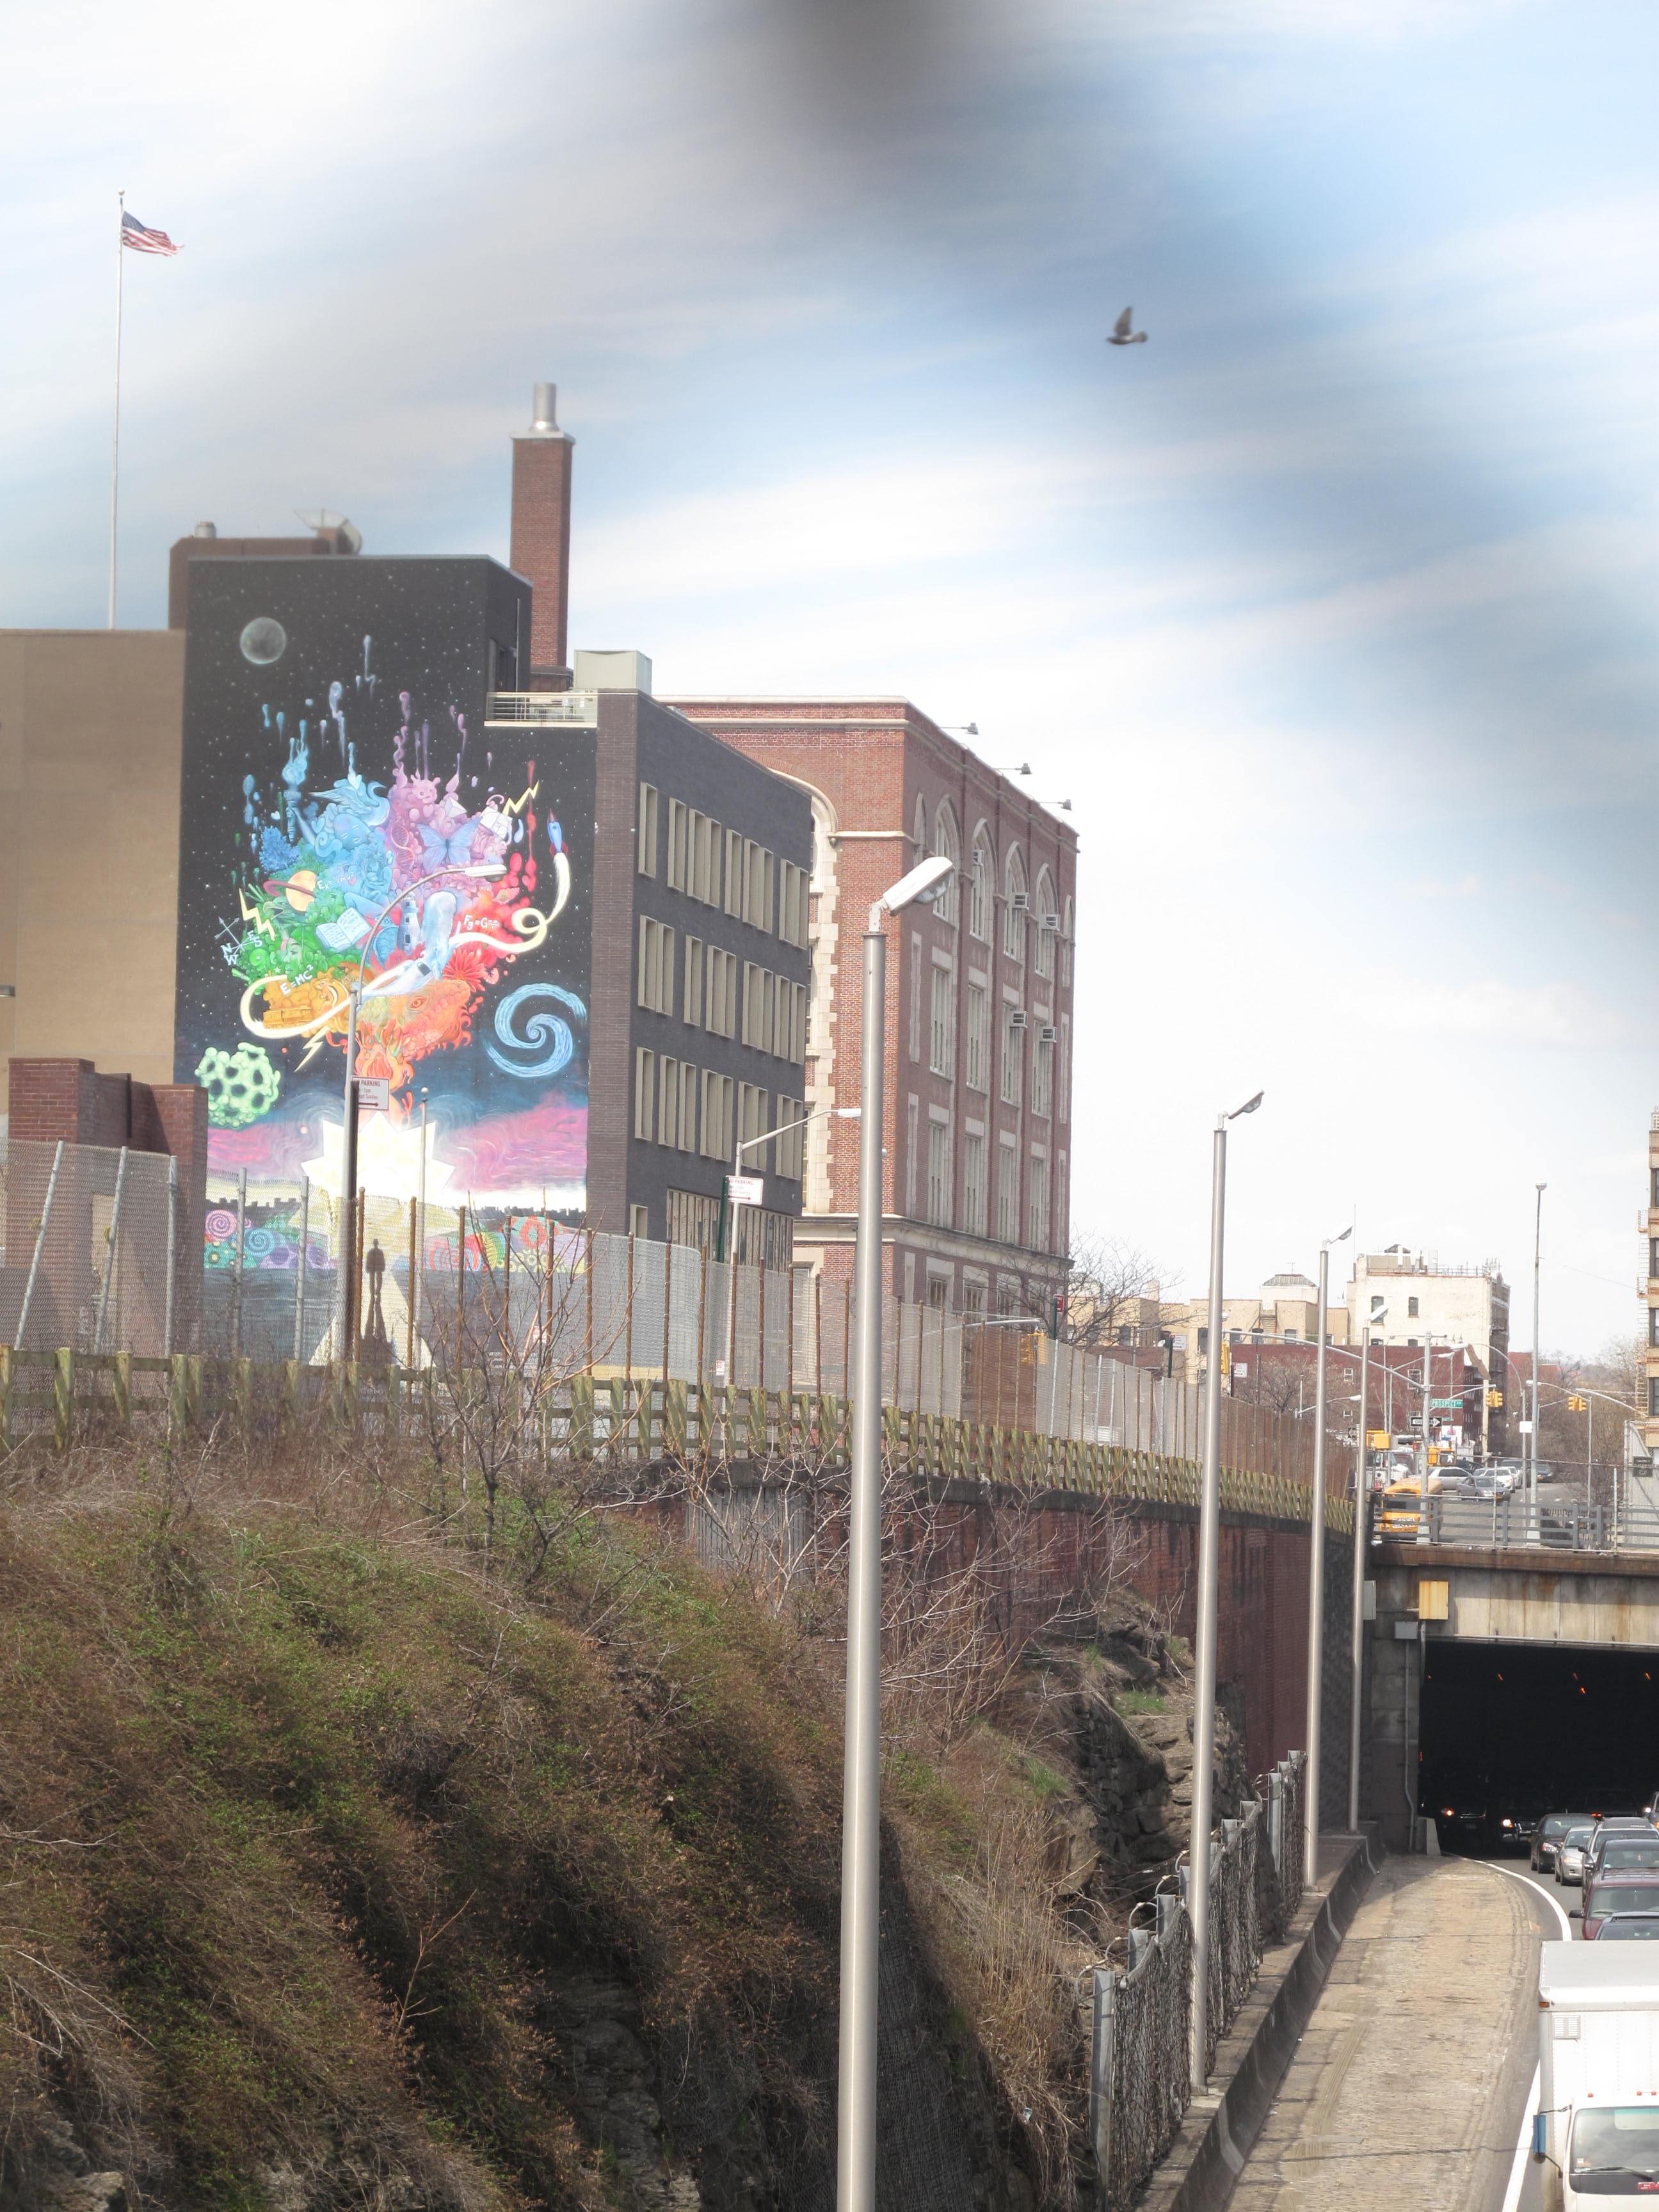 Cross Bronx Expressway Wall Mural | Lystria Hurley Blog